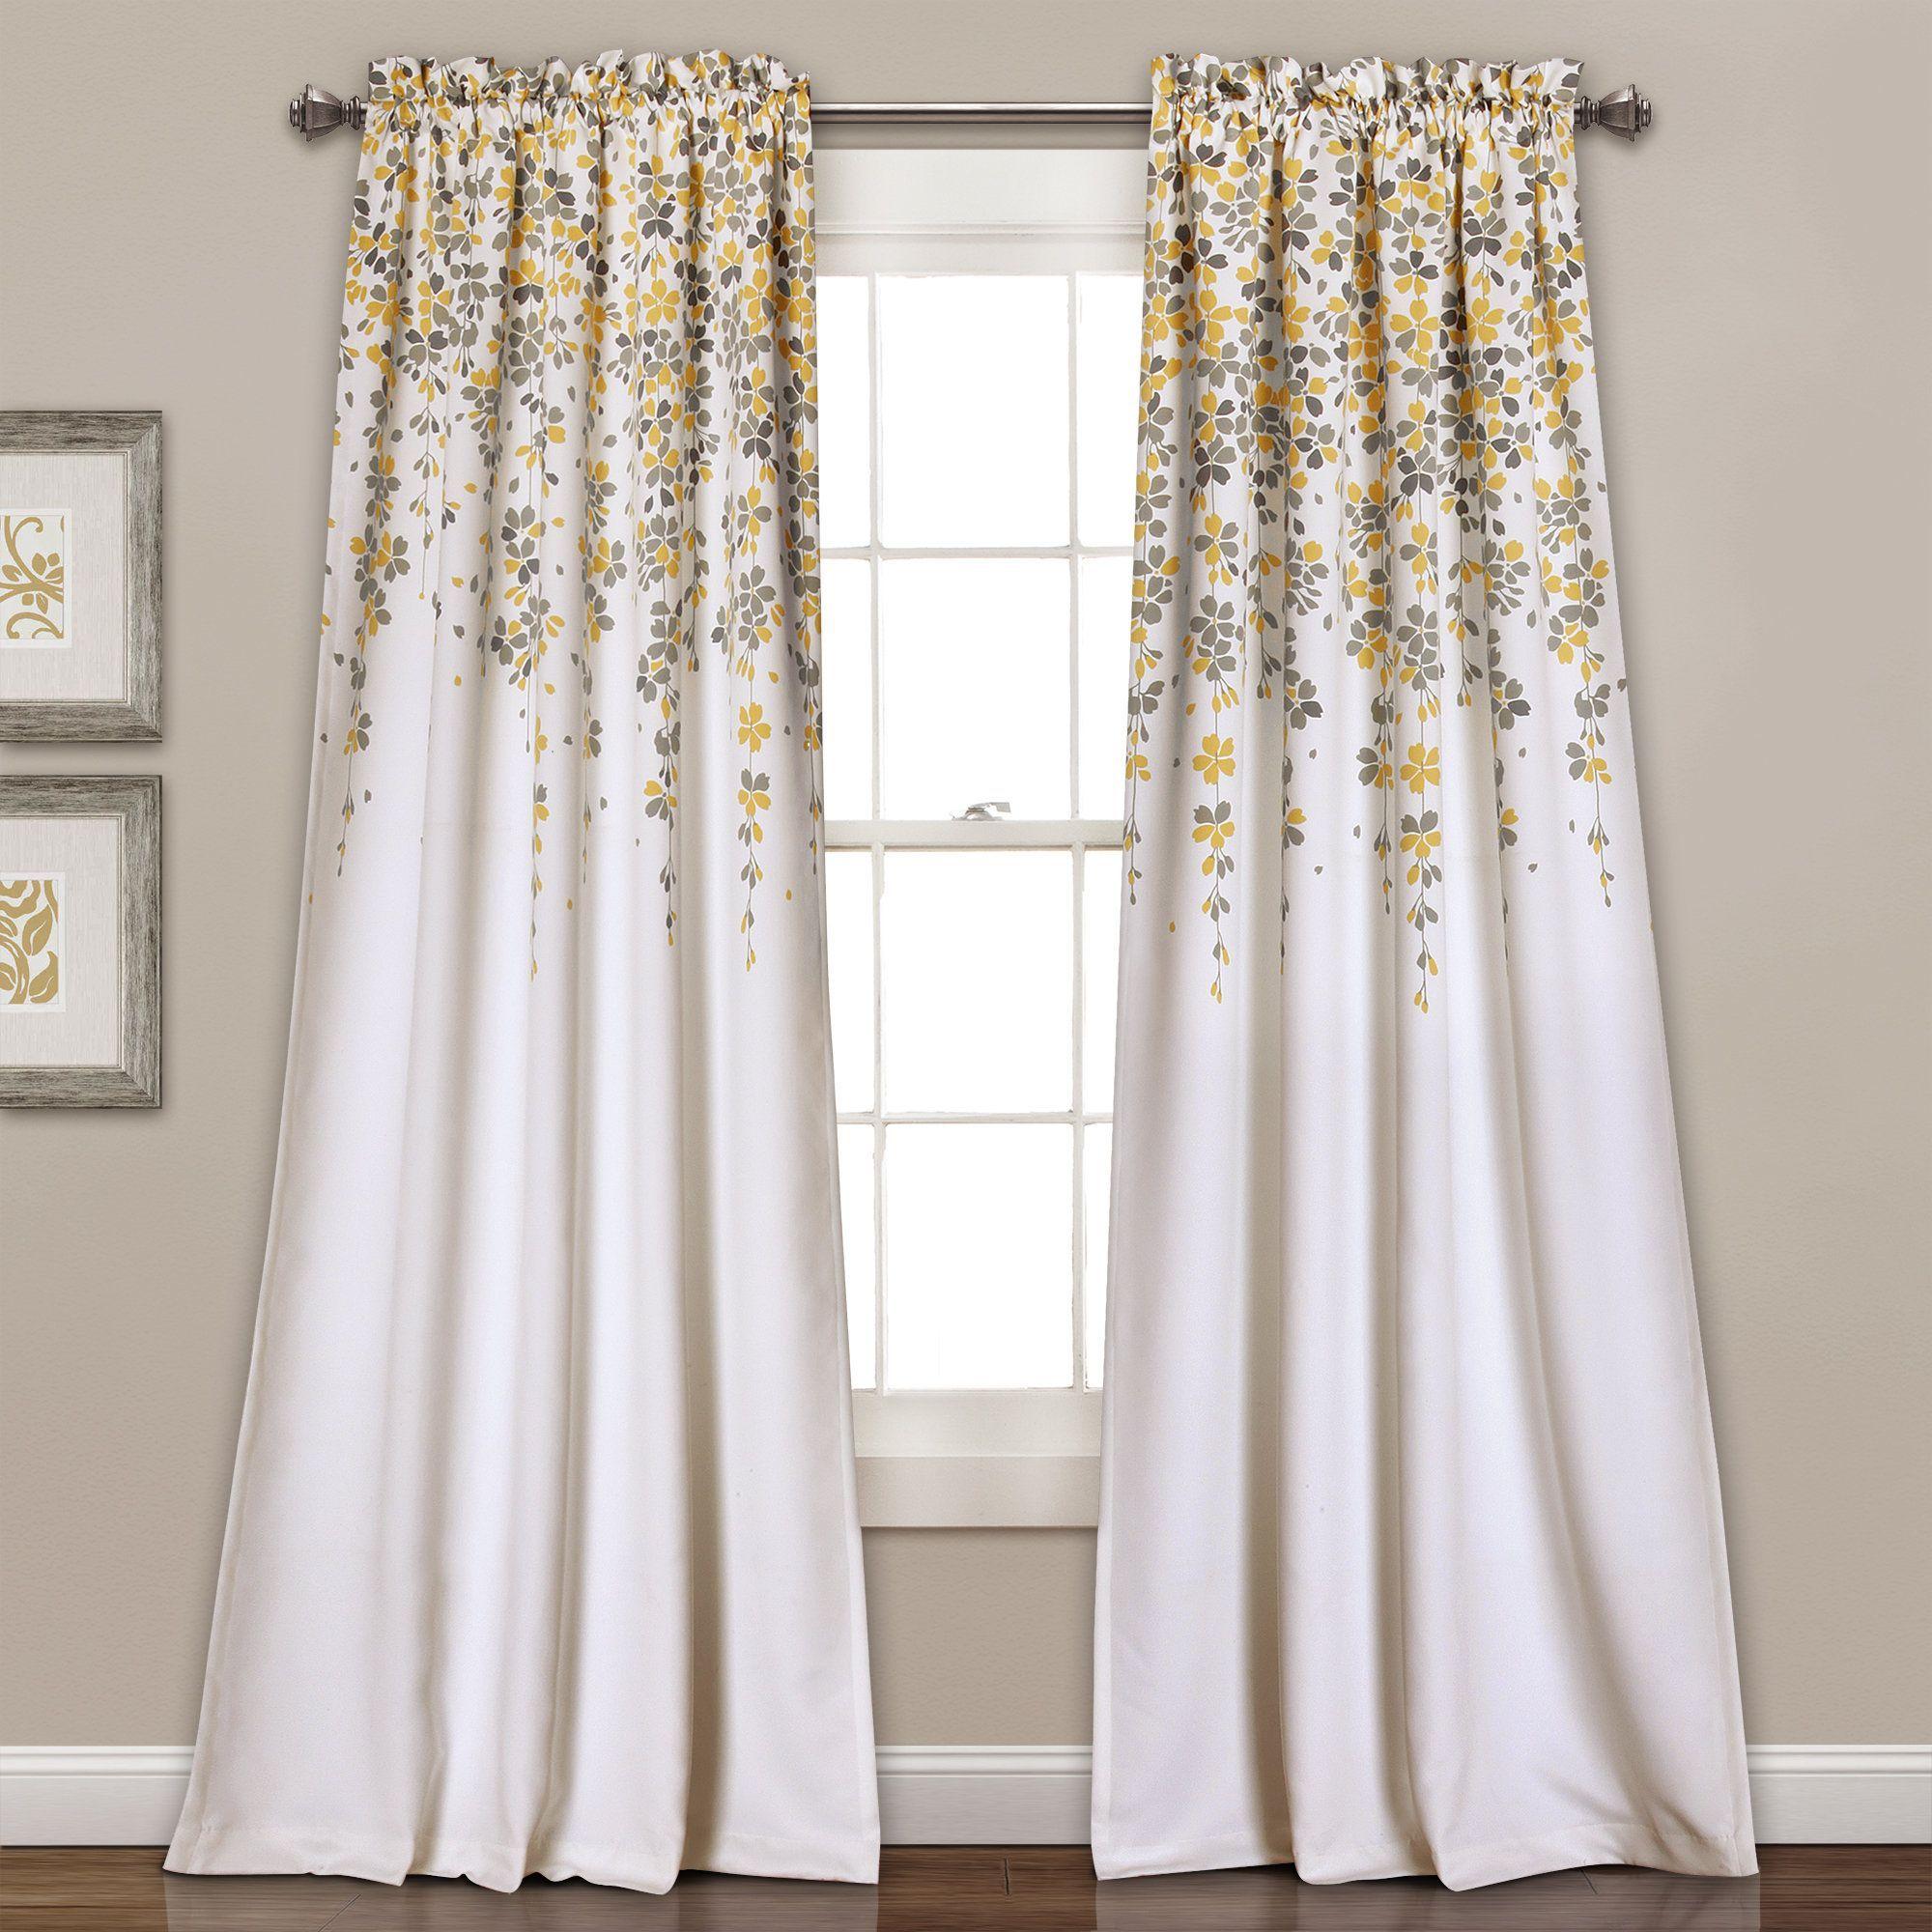 Lush Decor Weeping Flowers Room Darkening Window Curtain Panel Pair 84 X 52 2 Yellow Gray Grey Size Polyester Fl